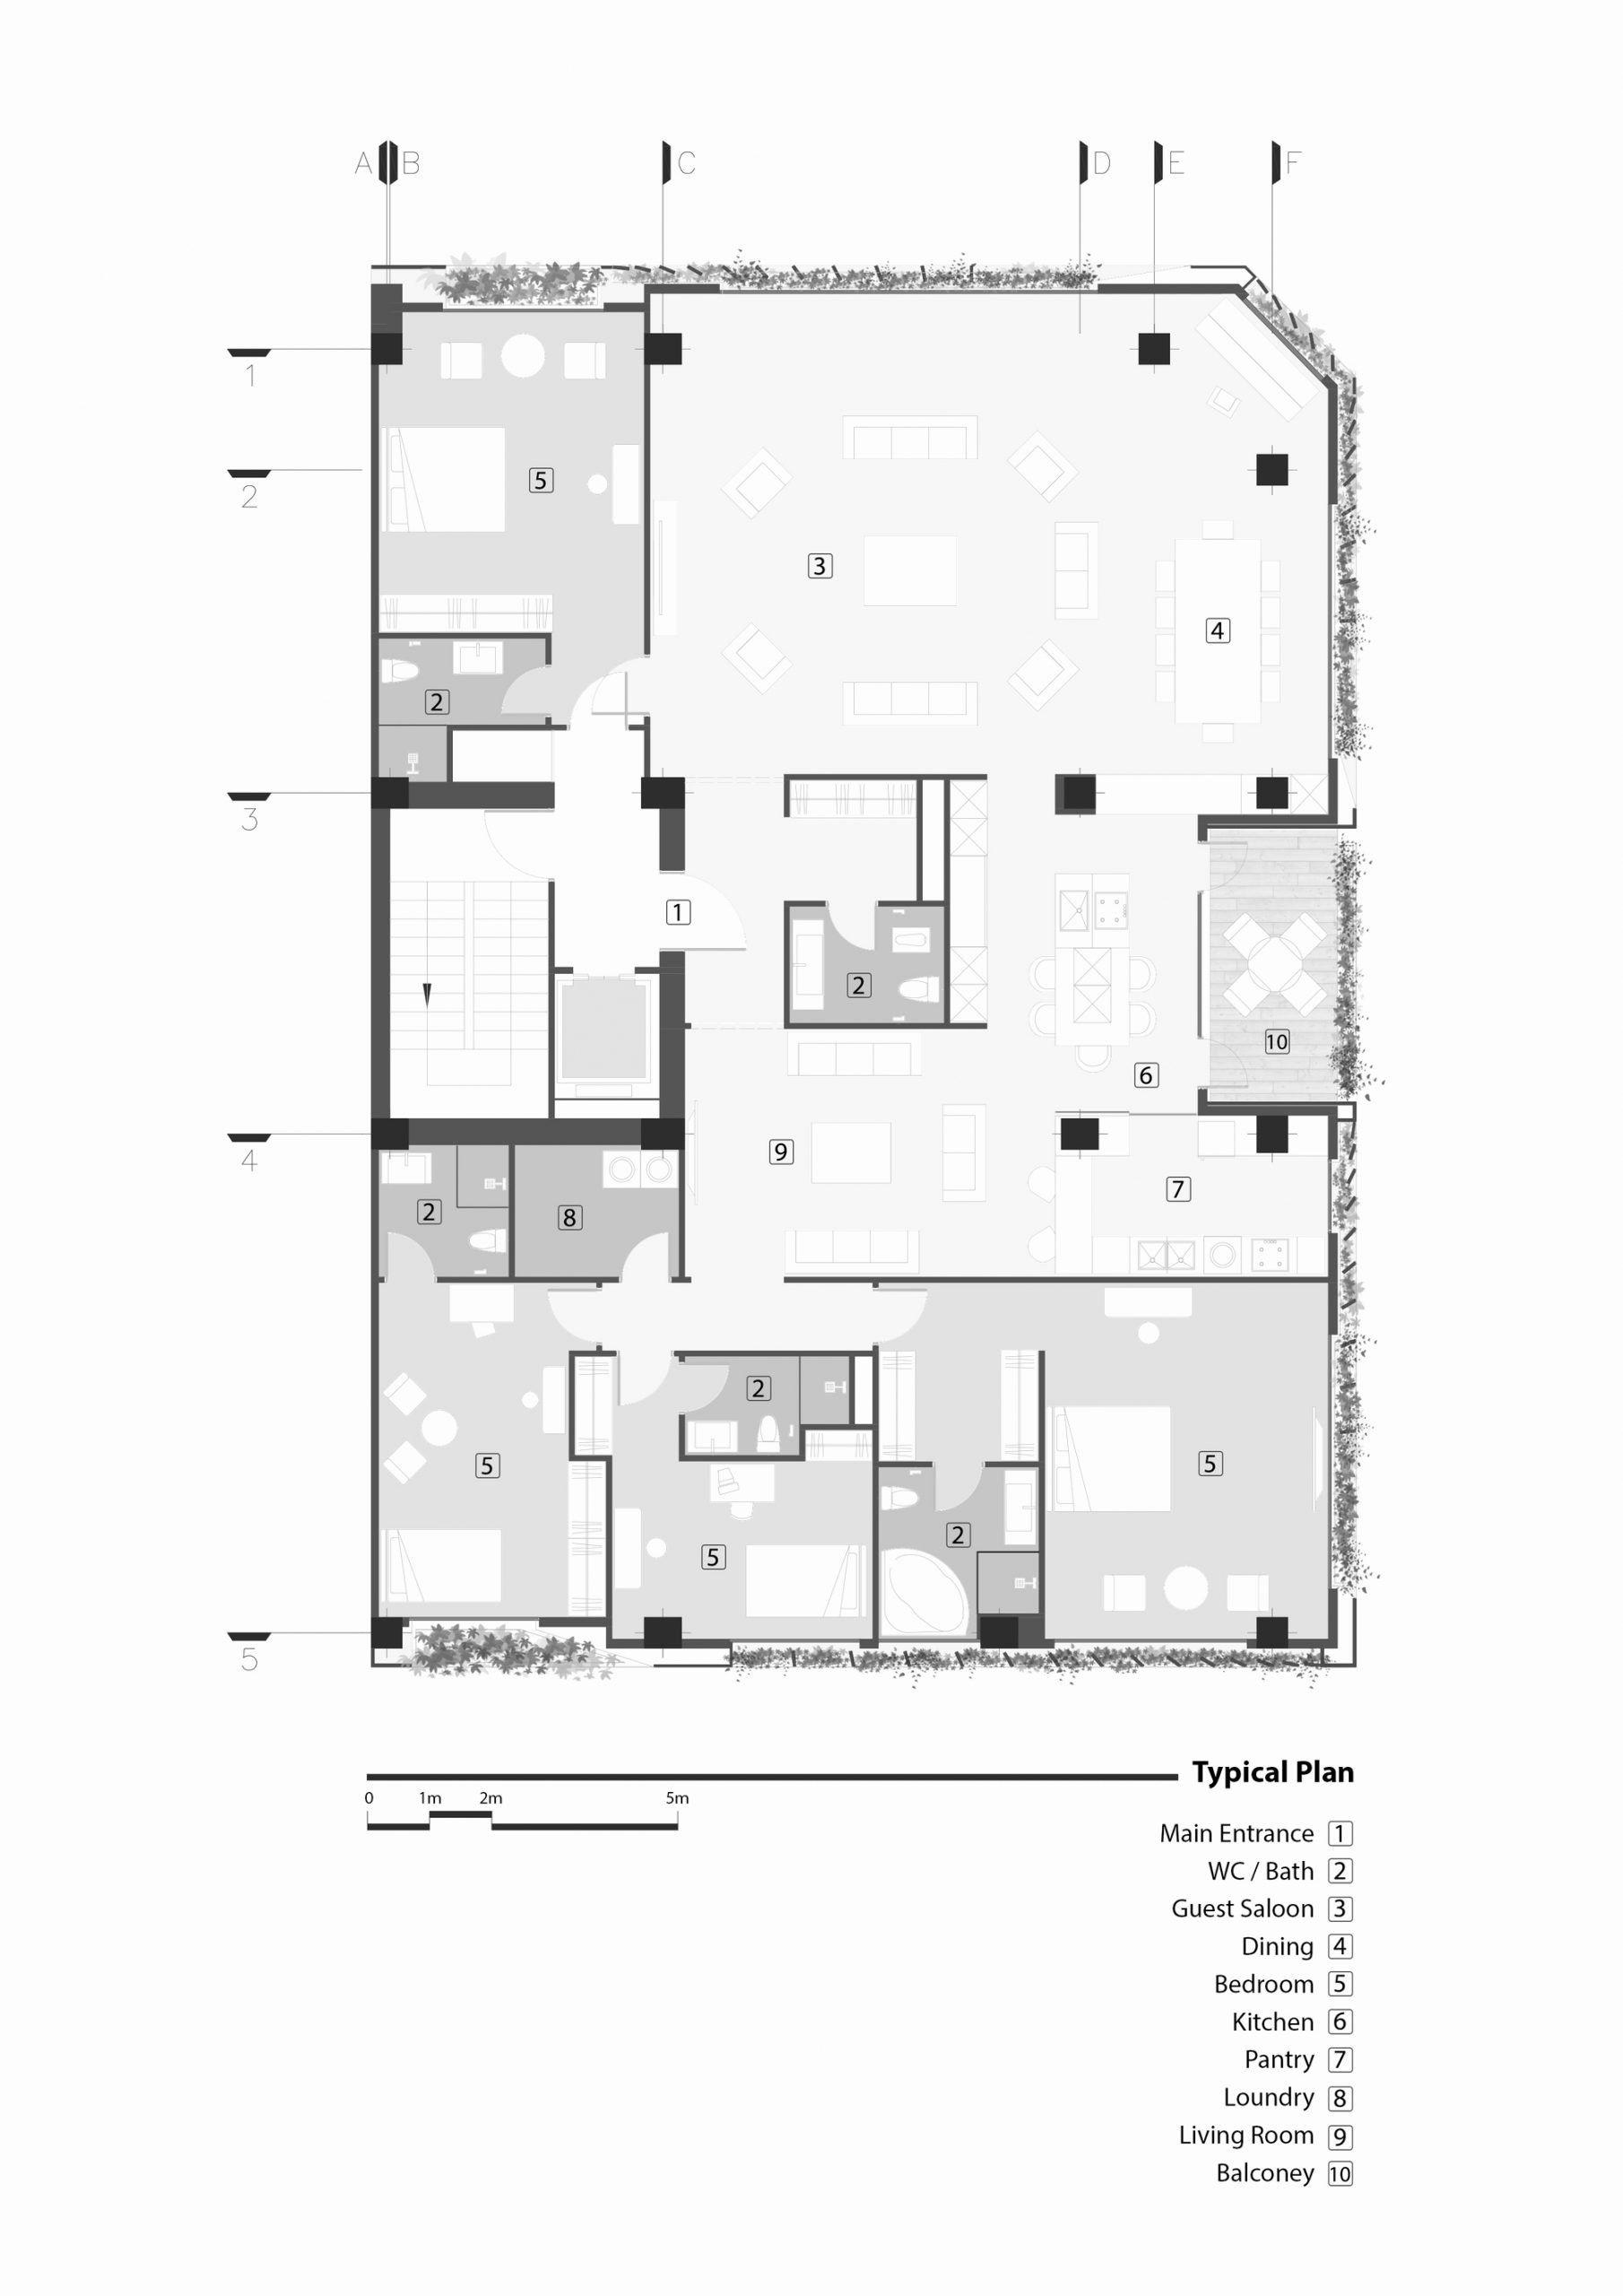 Greene And Greene House Plans Fresh Gallery Of Green House Karabon 27 In 2020 Carriage House Plans House Plans Bluebird House Plans